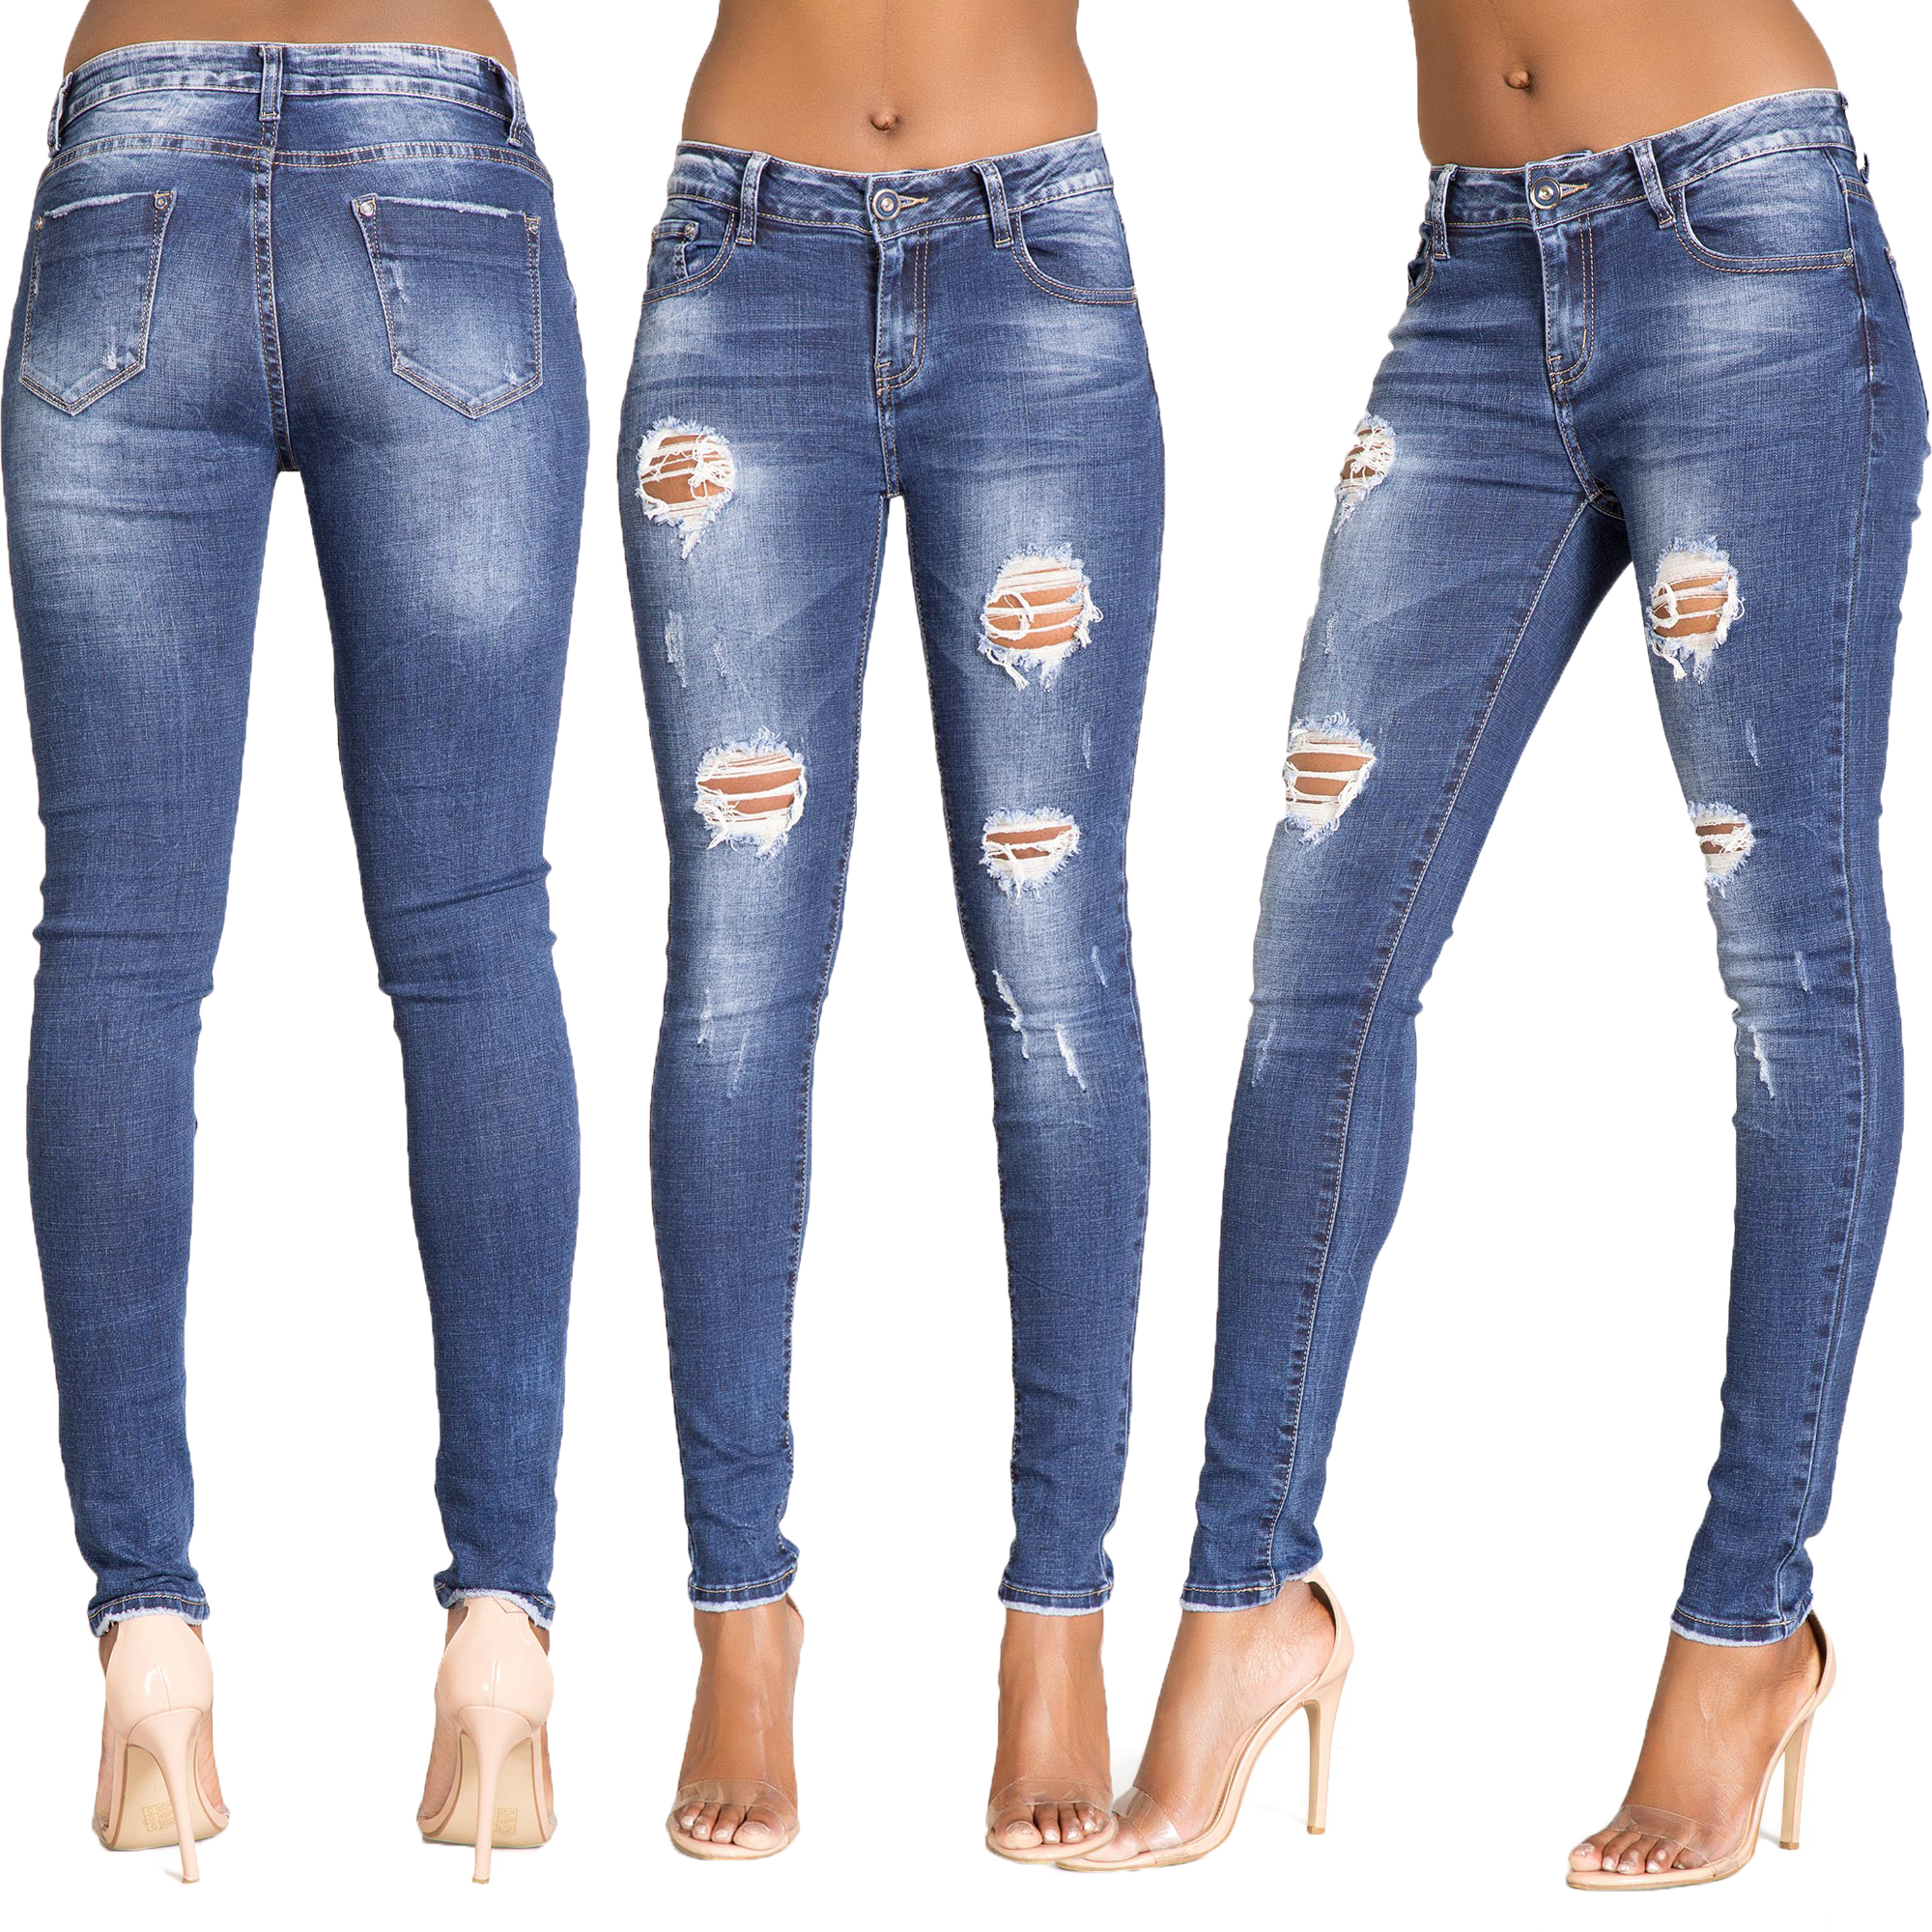 Womens-Blue-Ripped-Skinny-Jeans-Ladies-Jeggings-Slim-Fit-Denim-Size-6-8-10-12-14